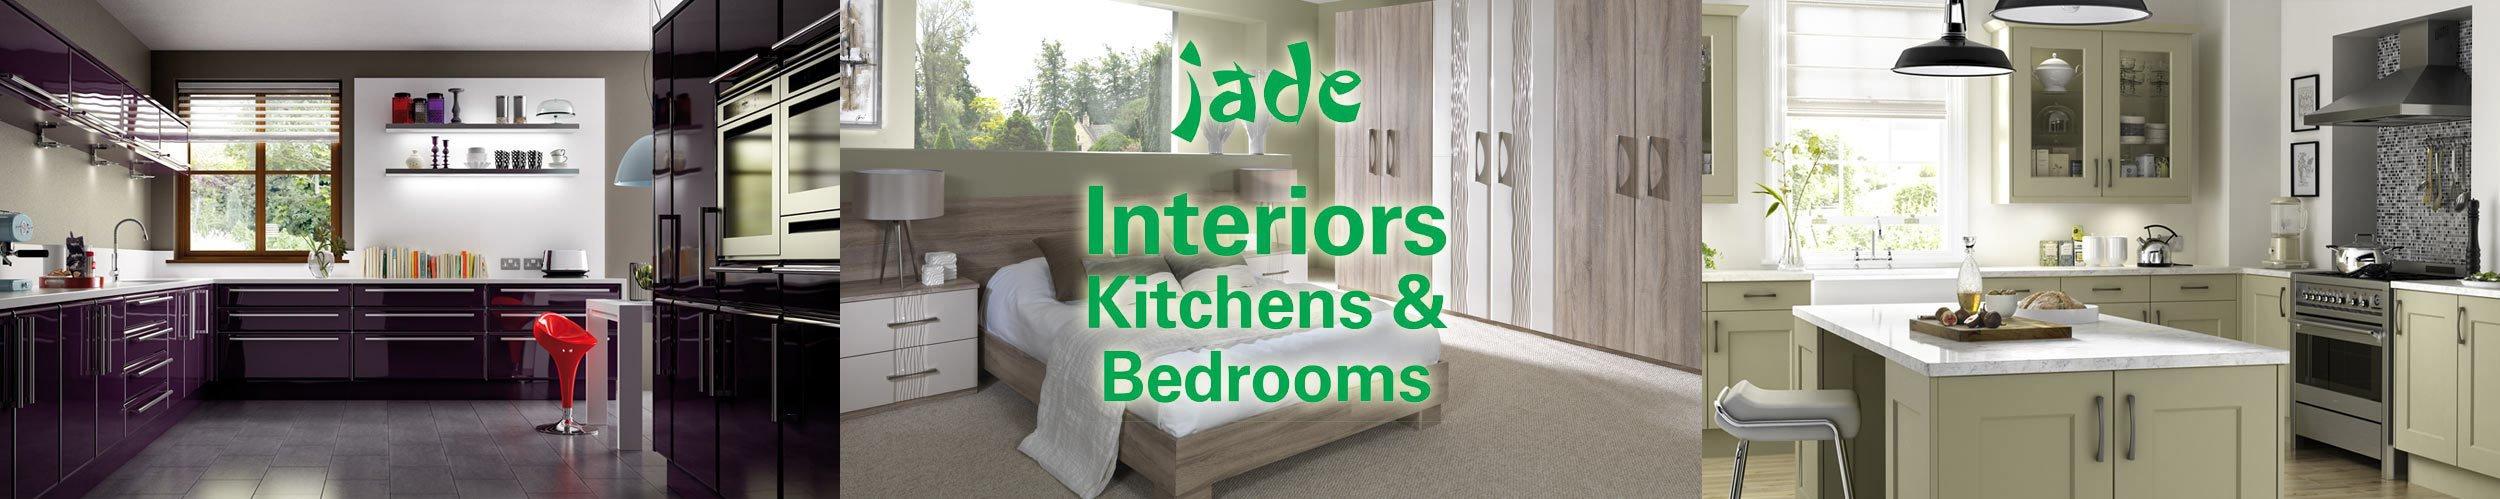 Jade Interiors